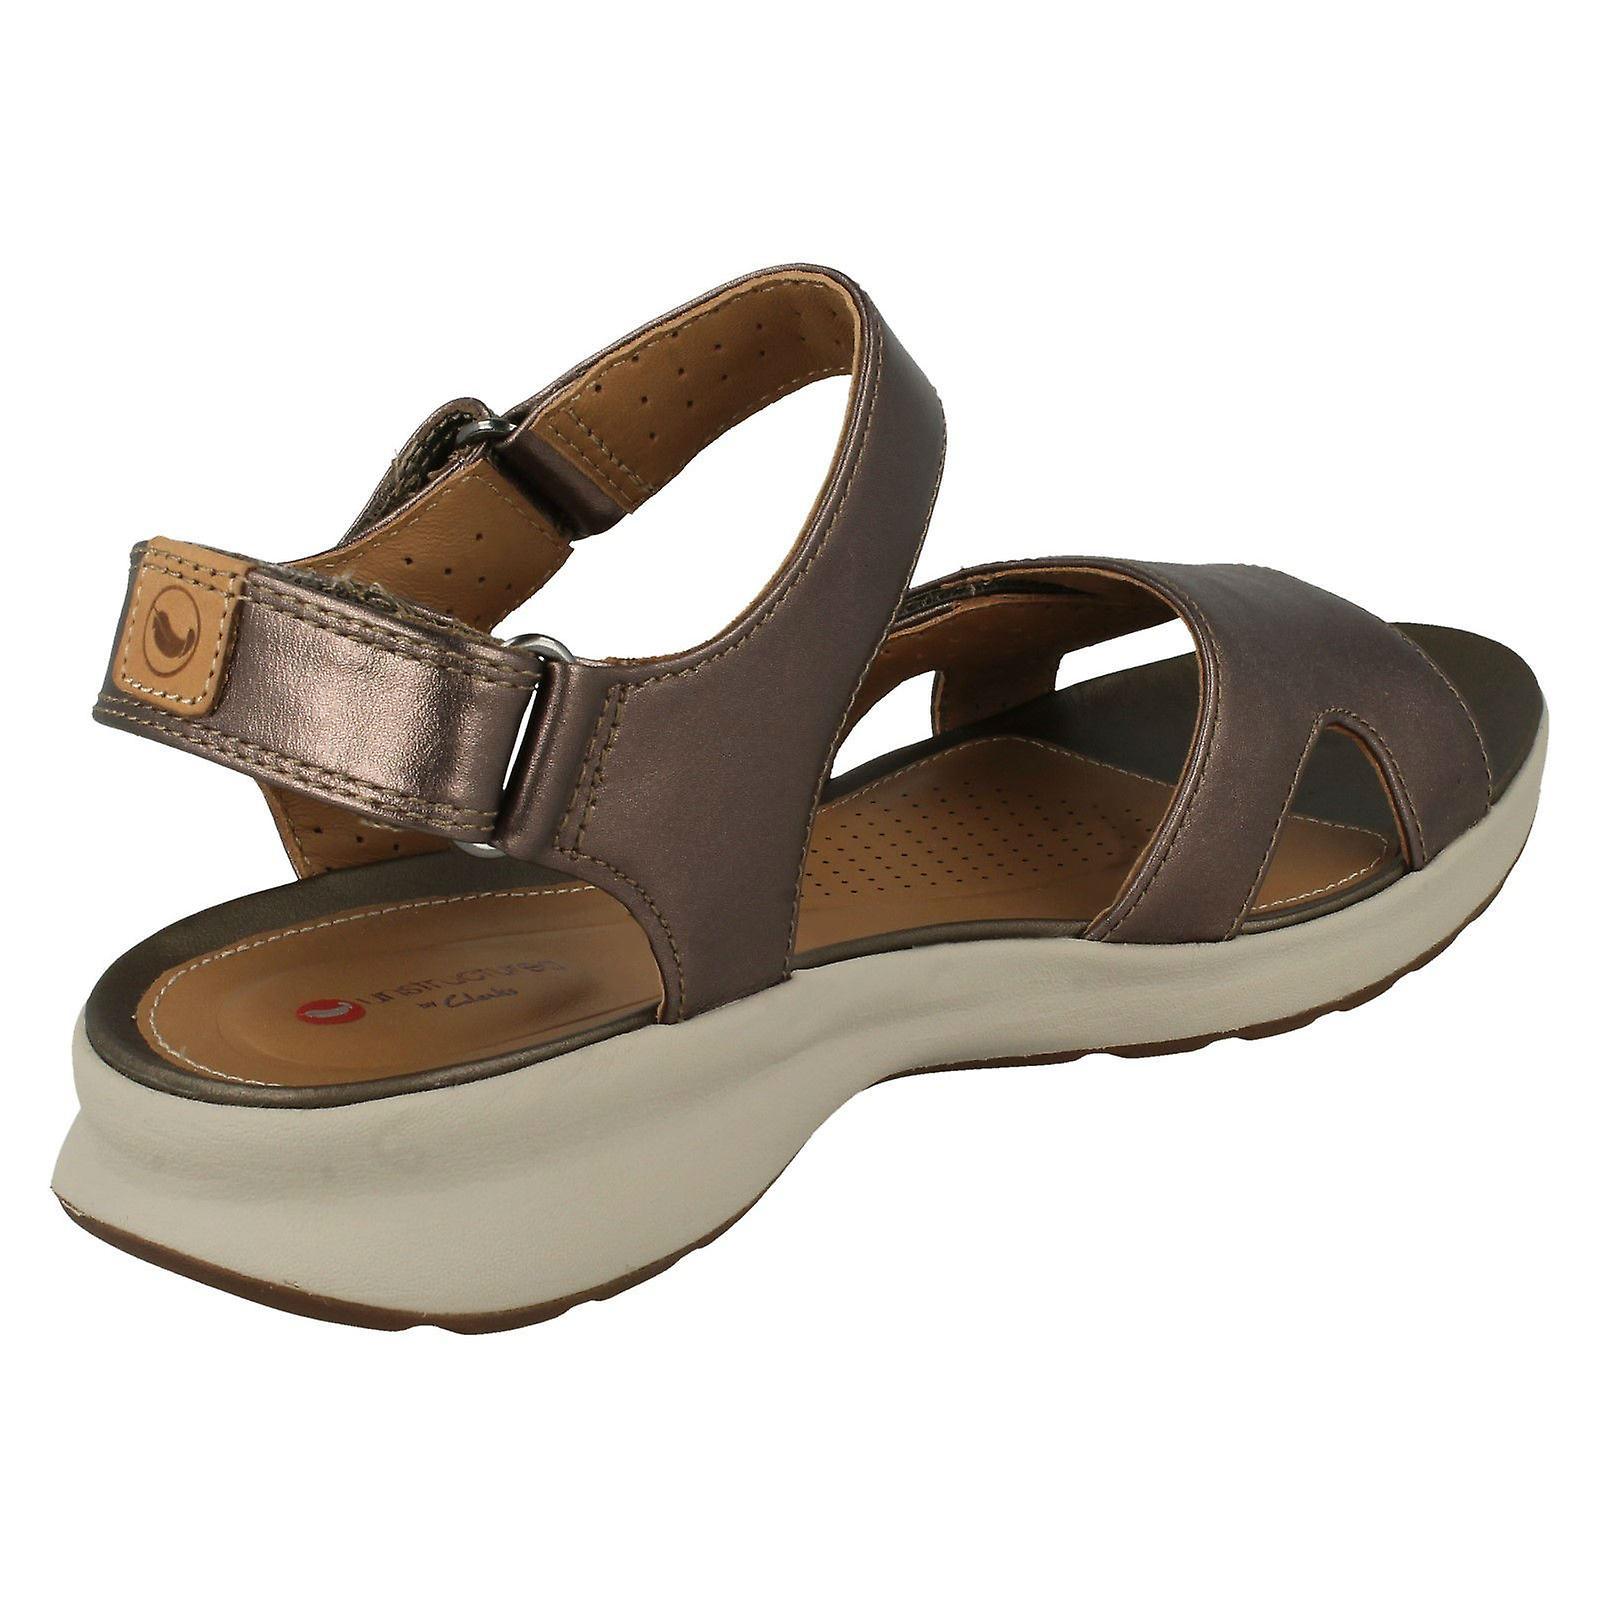 Ladies Clarks Unstructured Sandals Un Adorn Calm